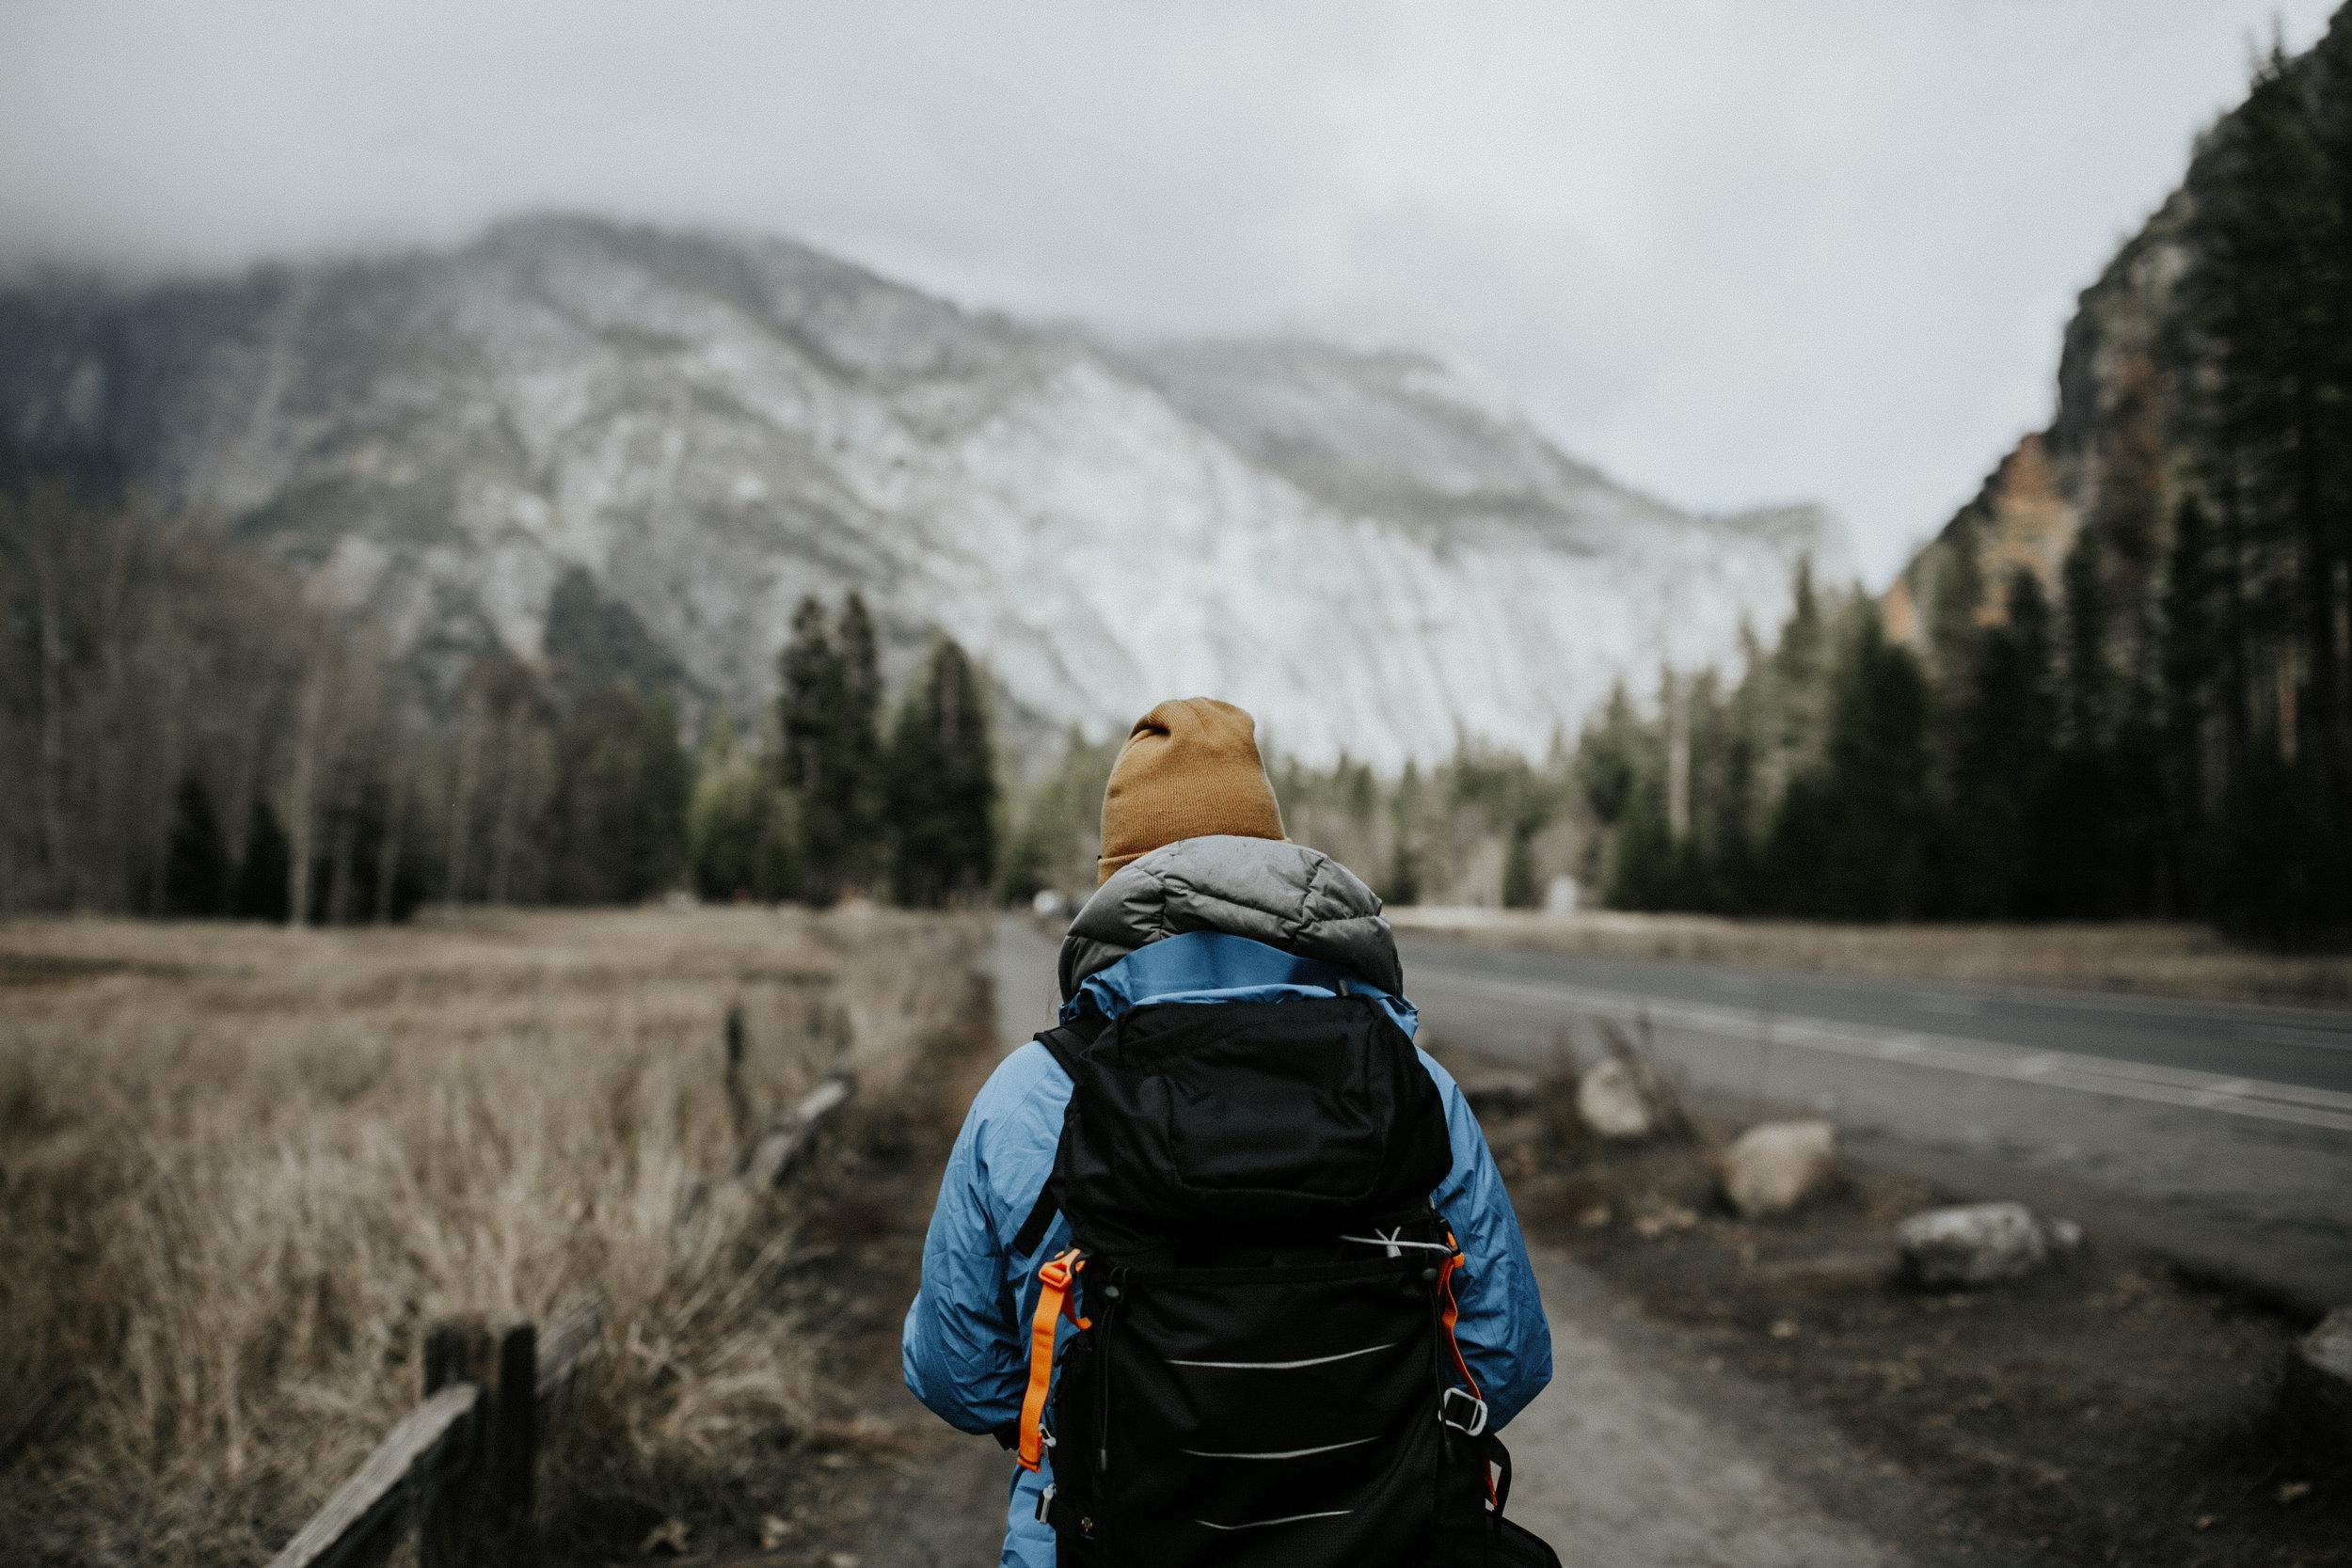 adventure-california-yosemite-photographer-grace-t-photography-23.jpg